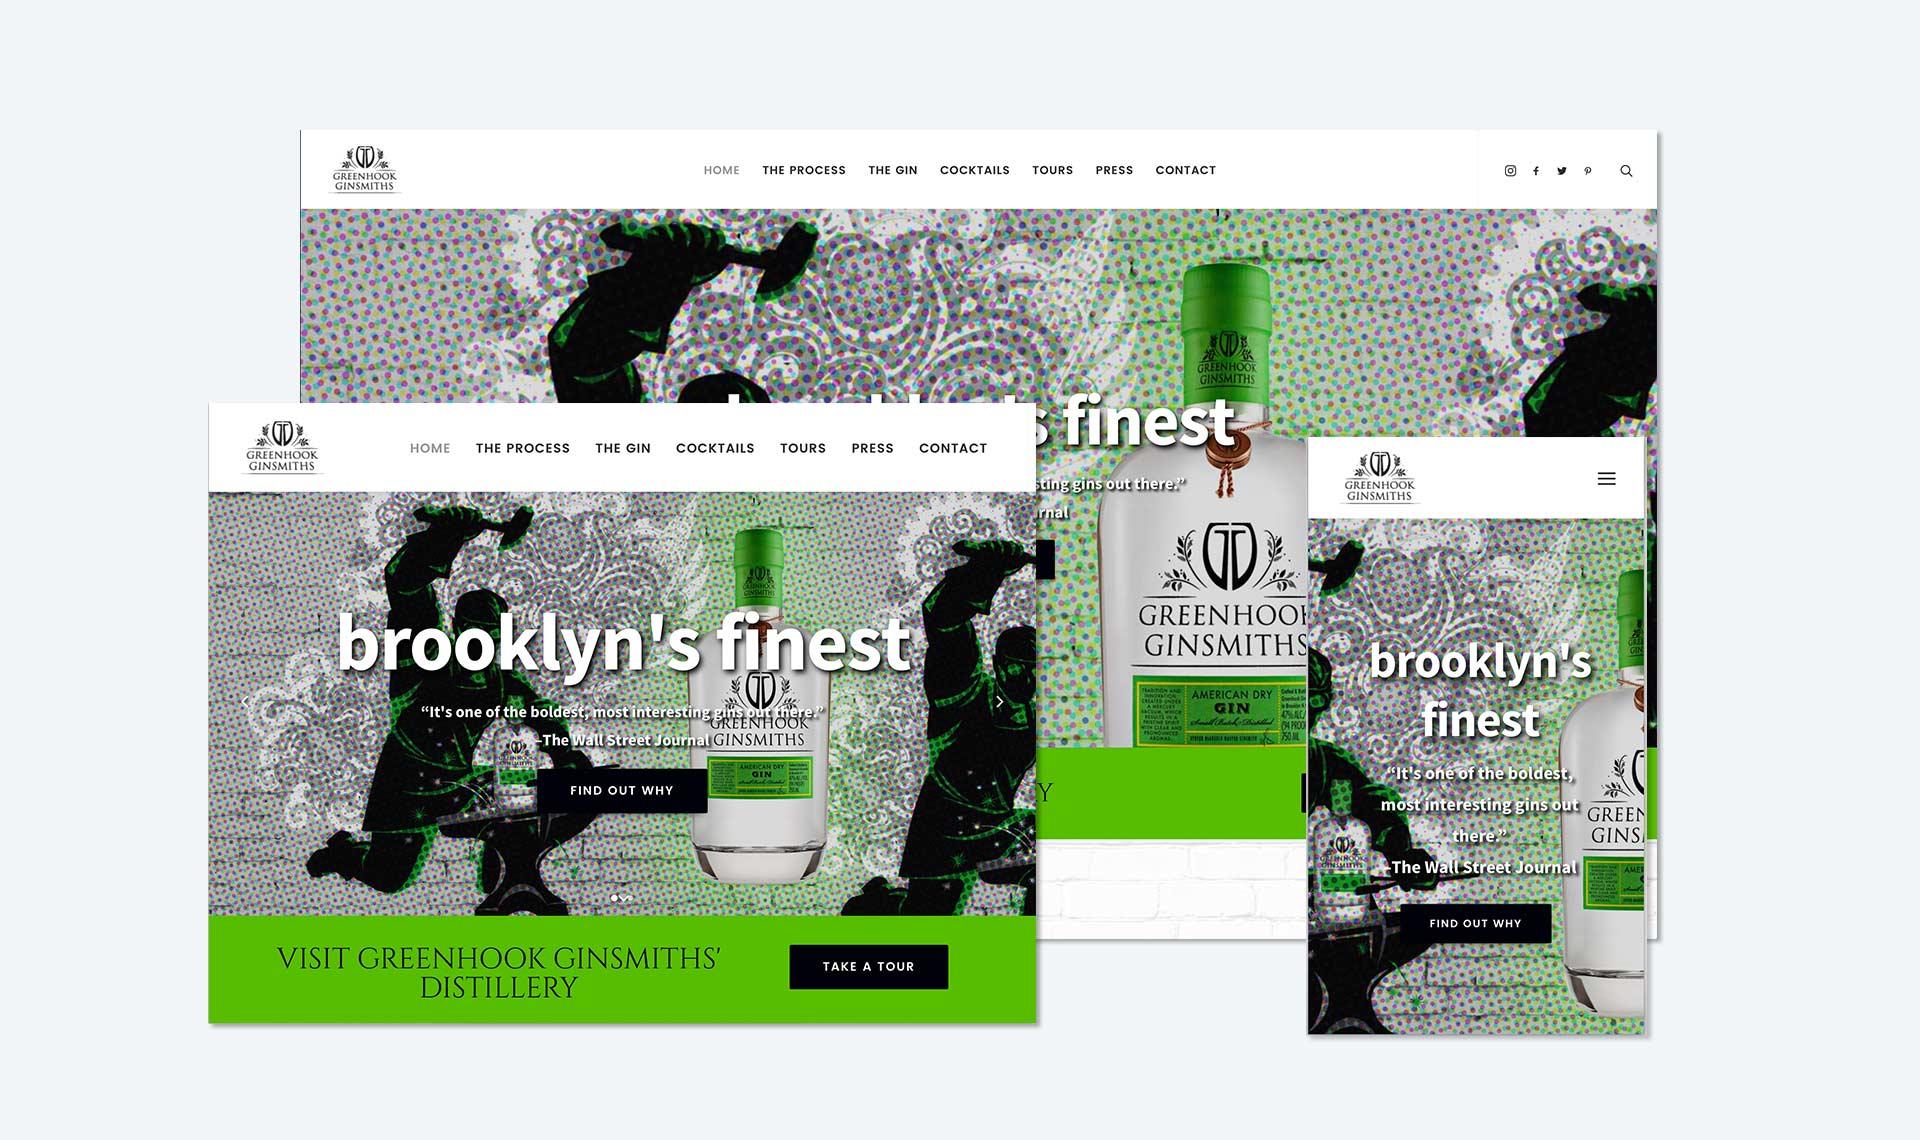 Greenhook Ginsmiths Screenshot 2 – Kural Design